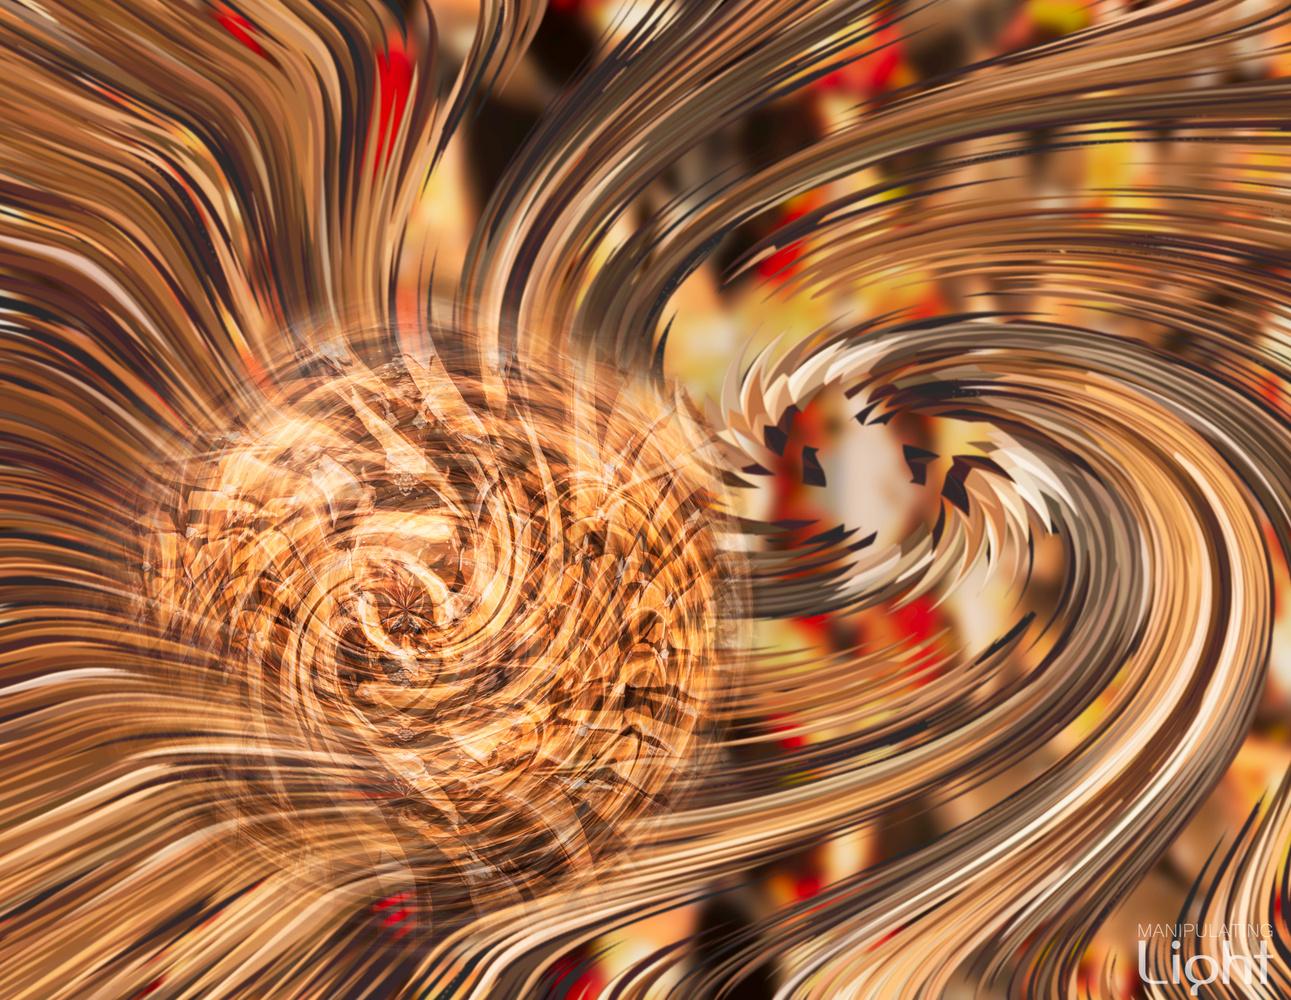 Sphere by Steven Mullins